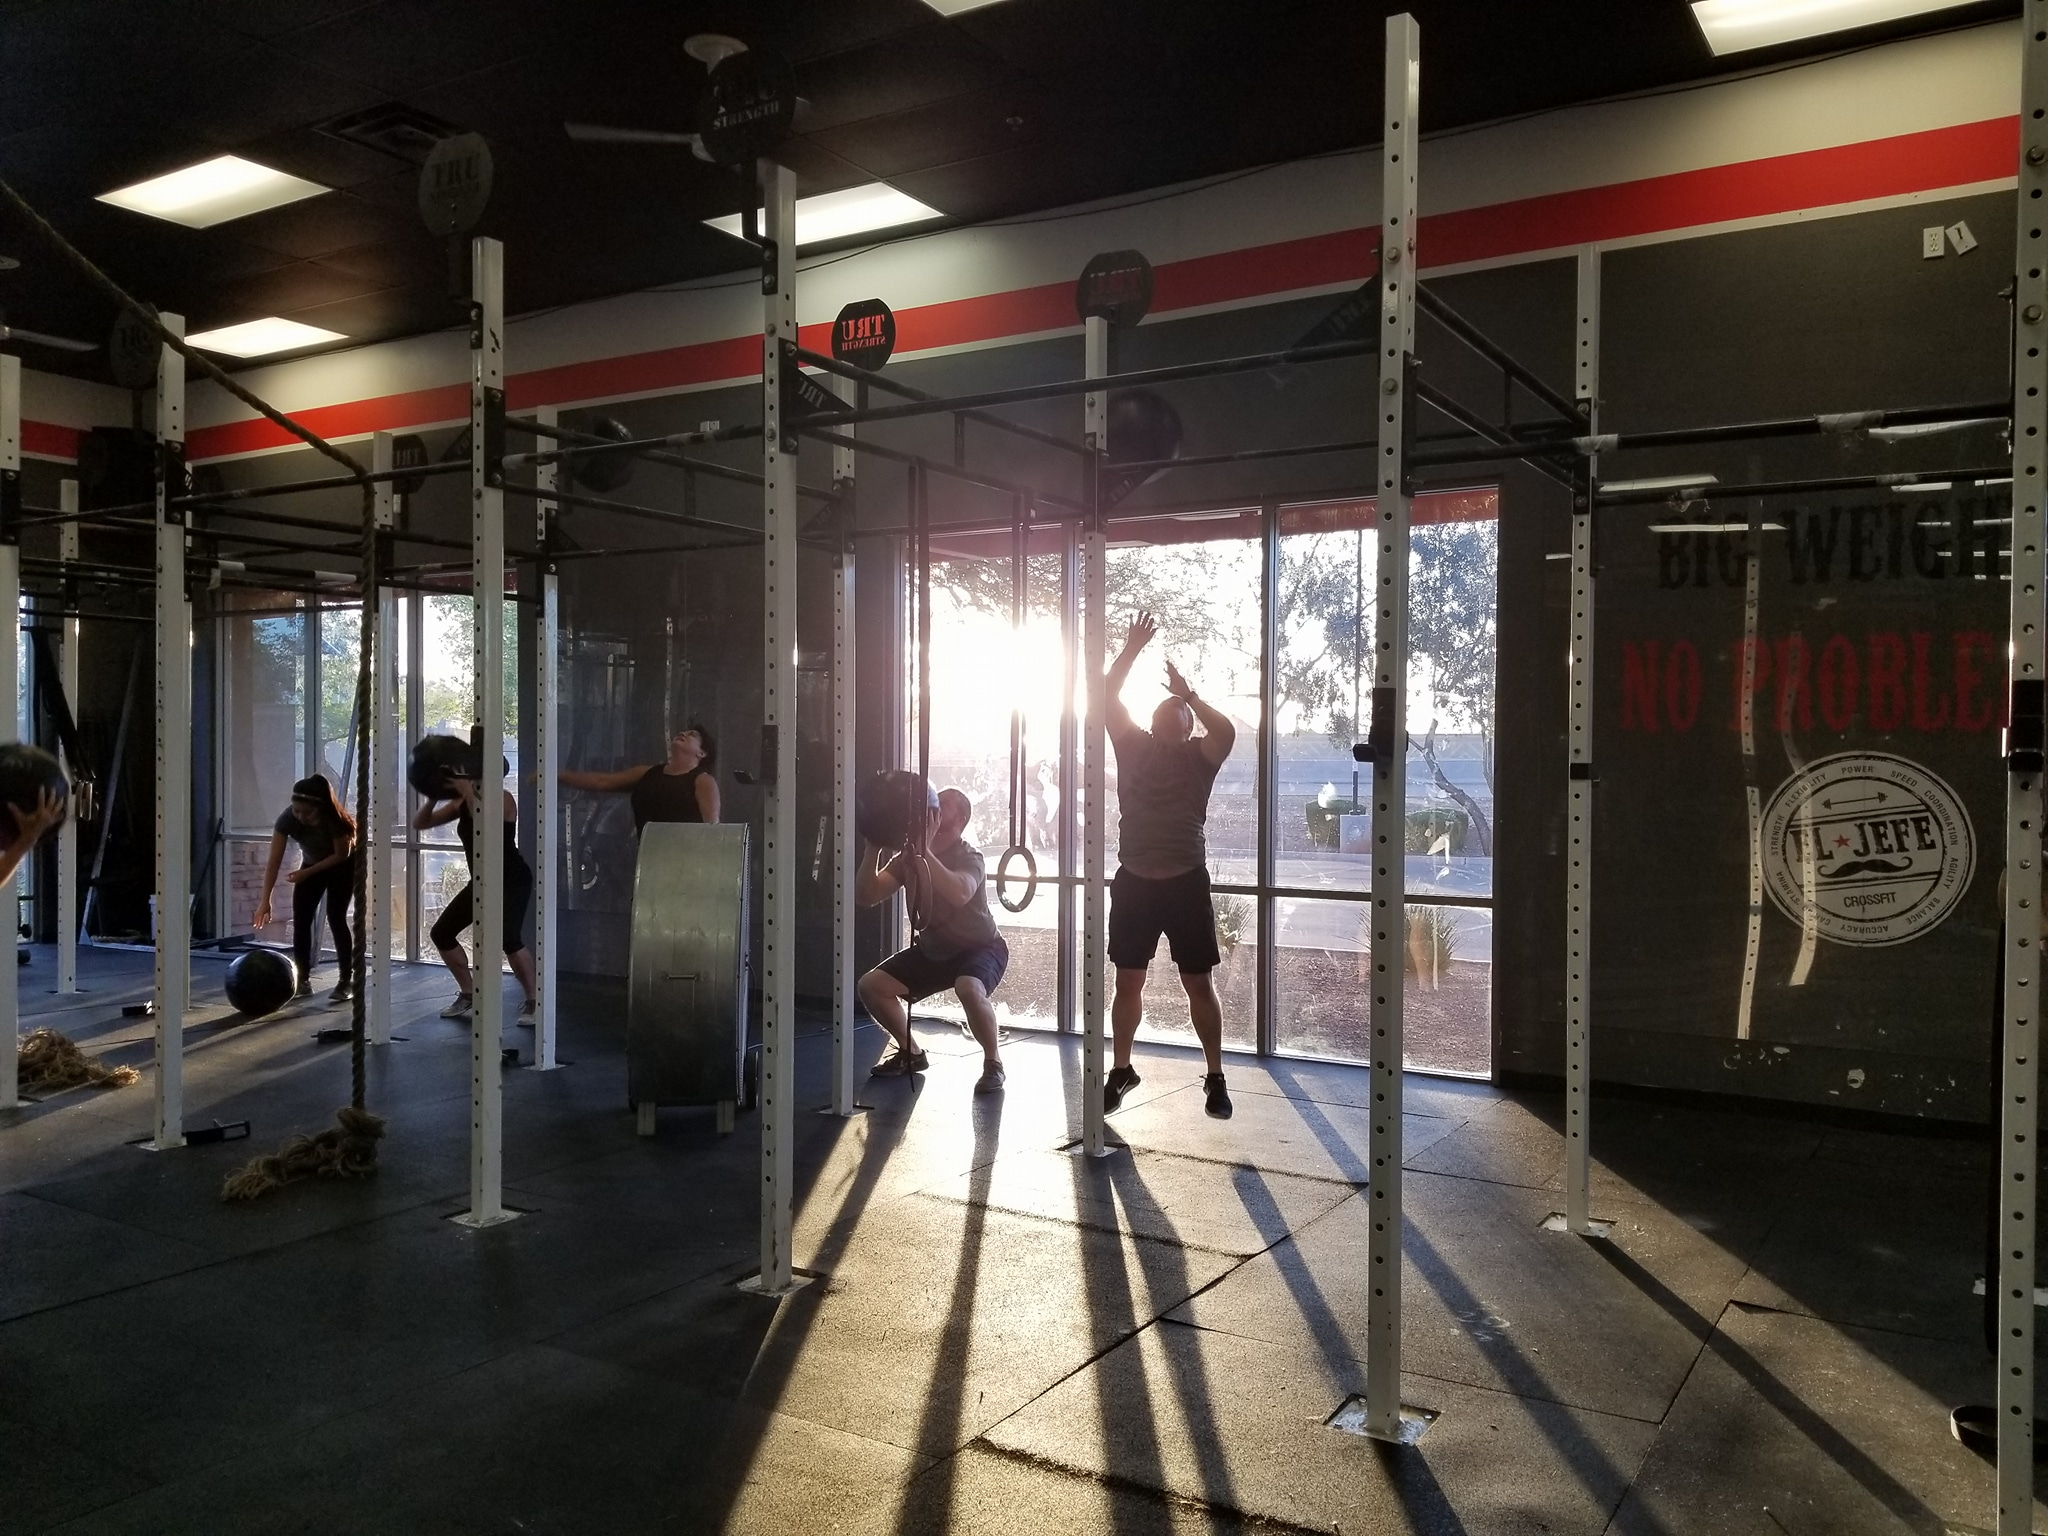 Training (Wall Ball)